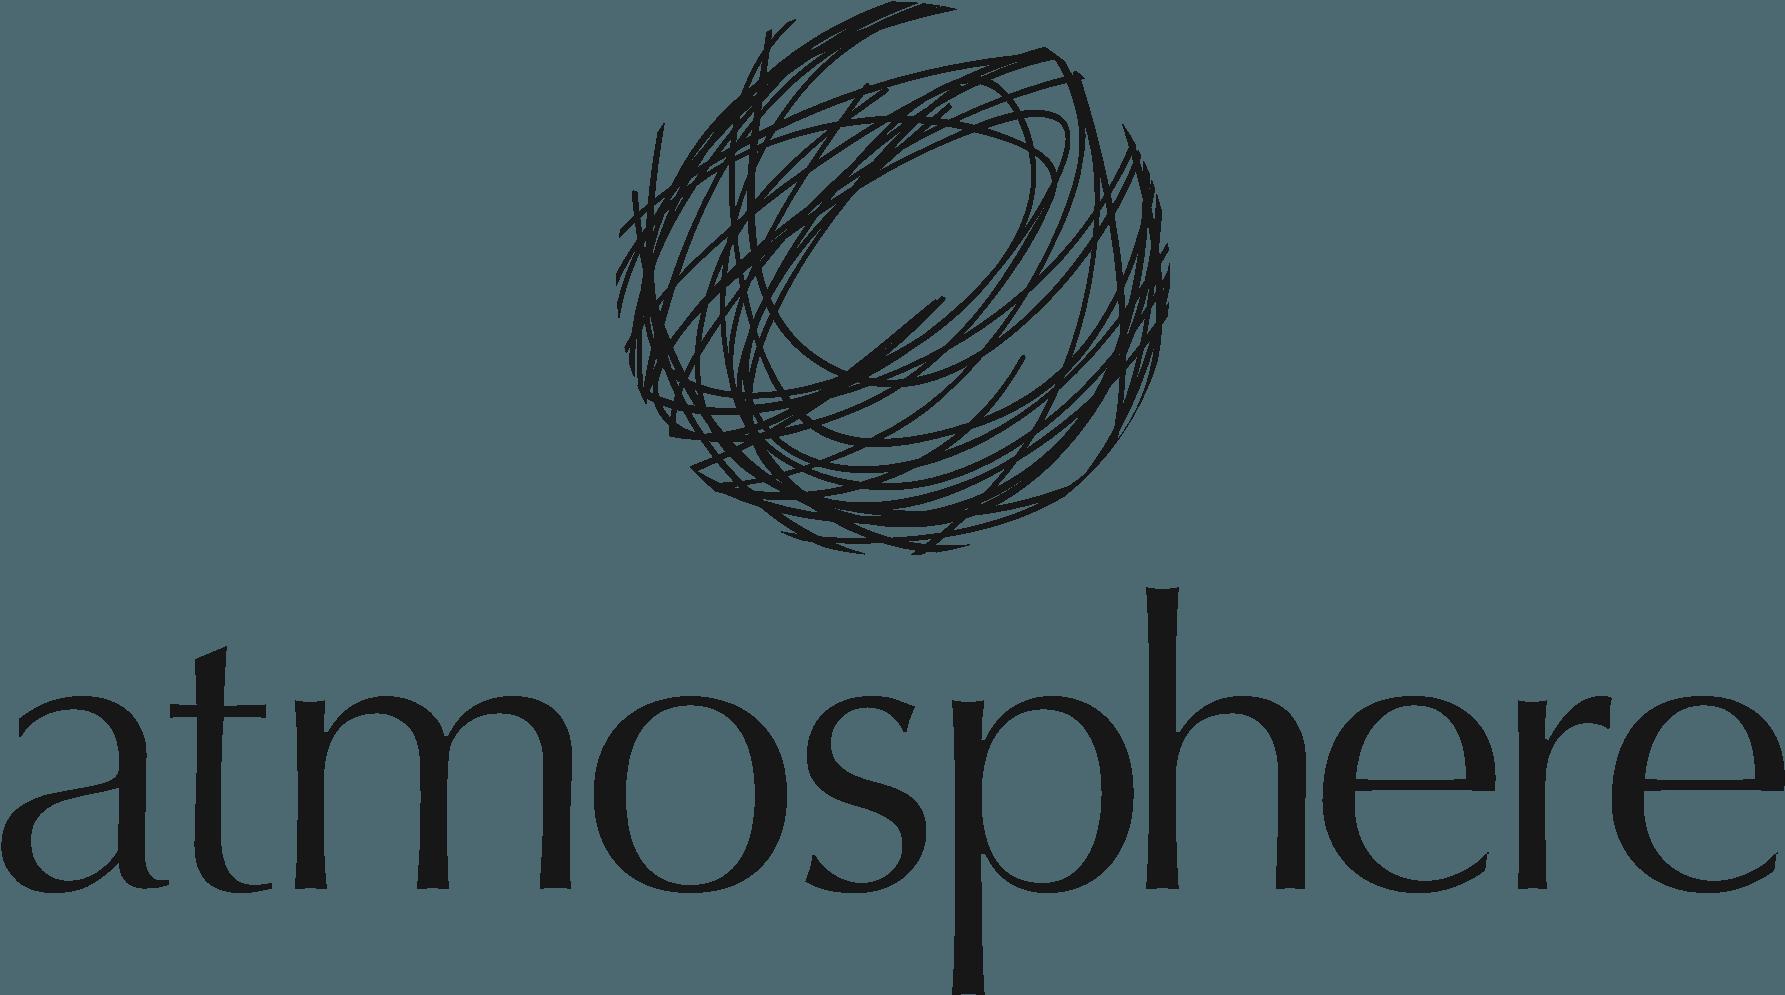 Atmosphere Creatori D'emozioni logo Palermo